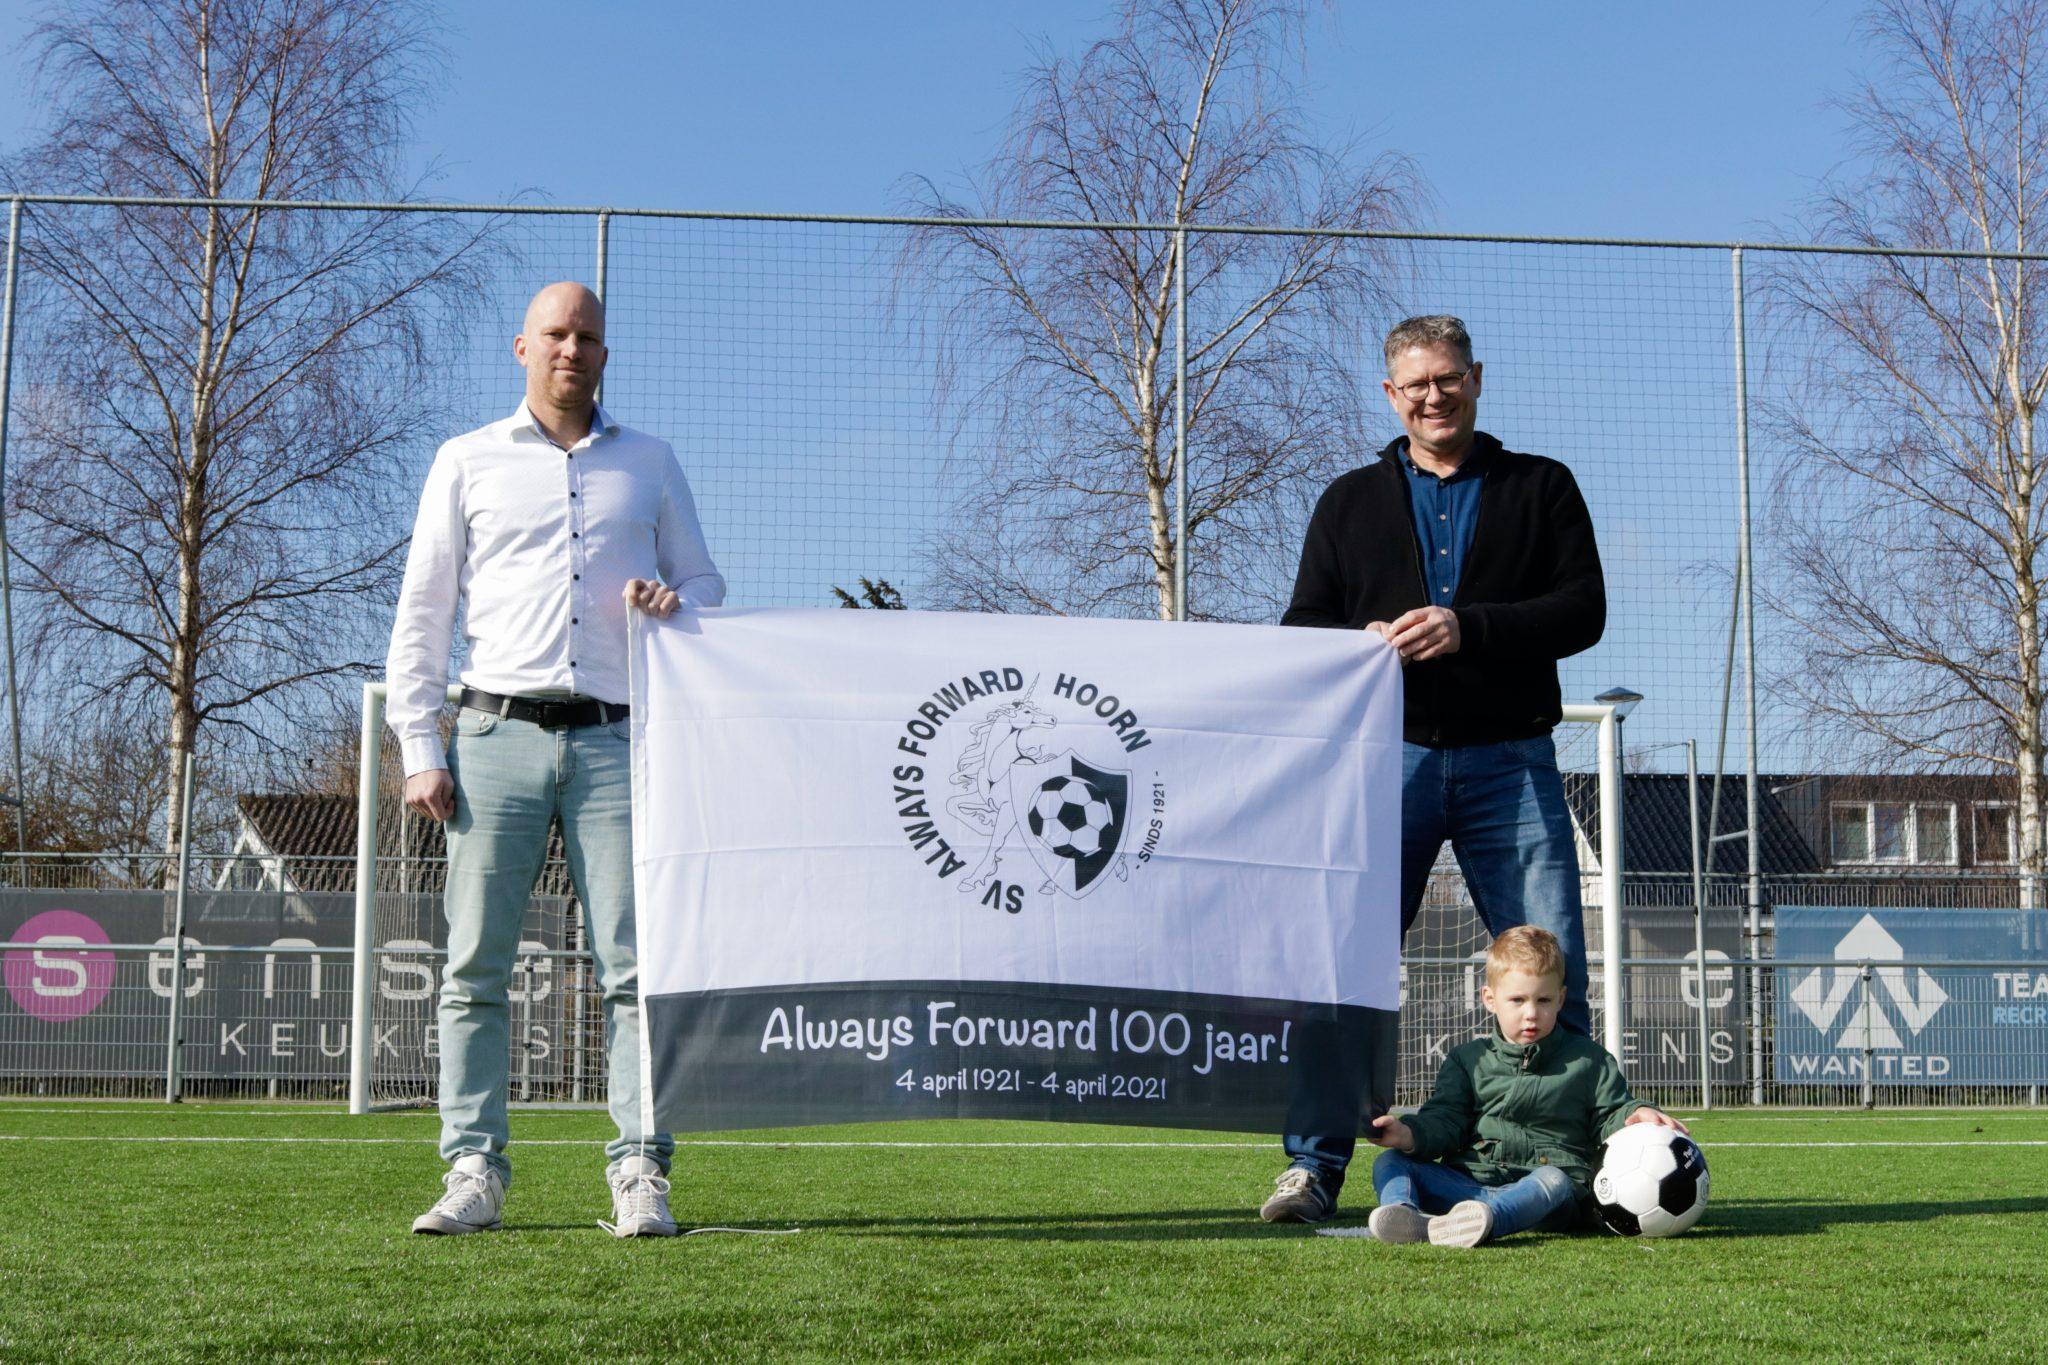 Trainers staf zondag selectie seizoen 2021/2022